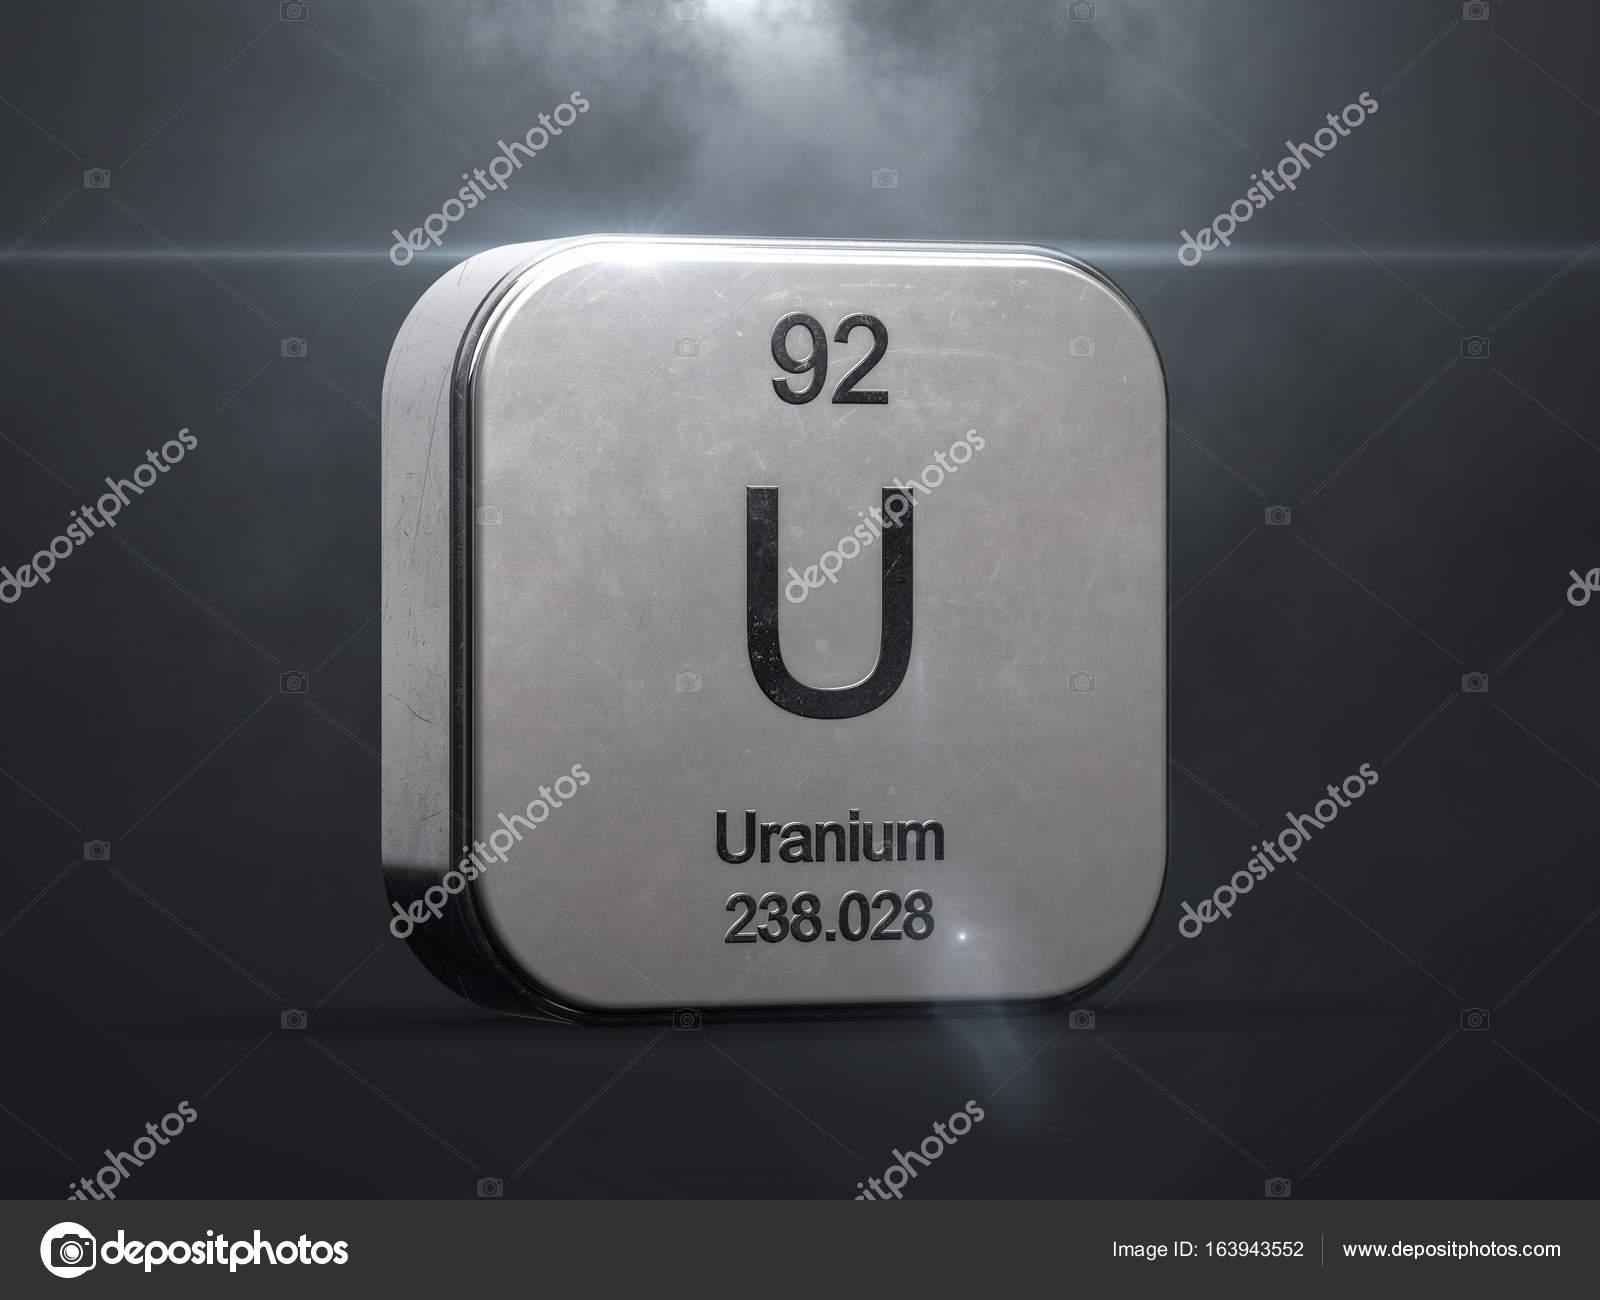 Uranium element from the periodic table stock photo conceptw uranium element from the periodic table stock photo buycottarizona Images